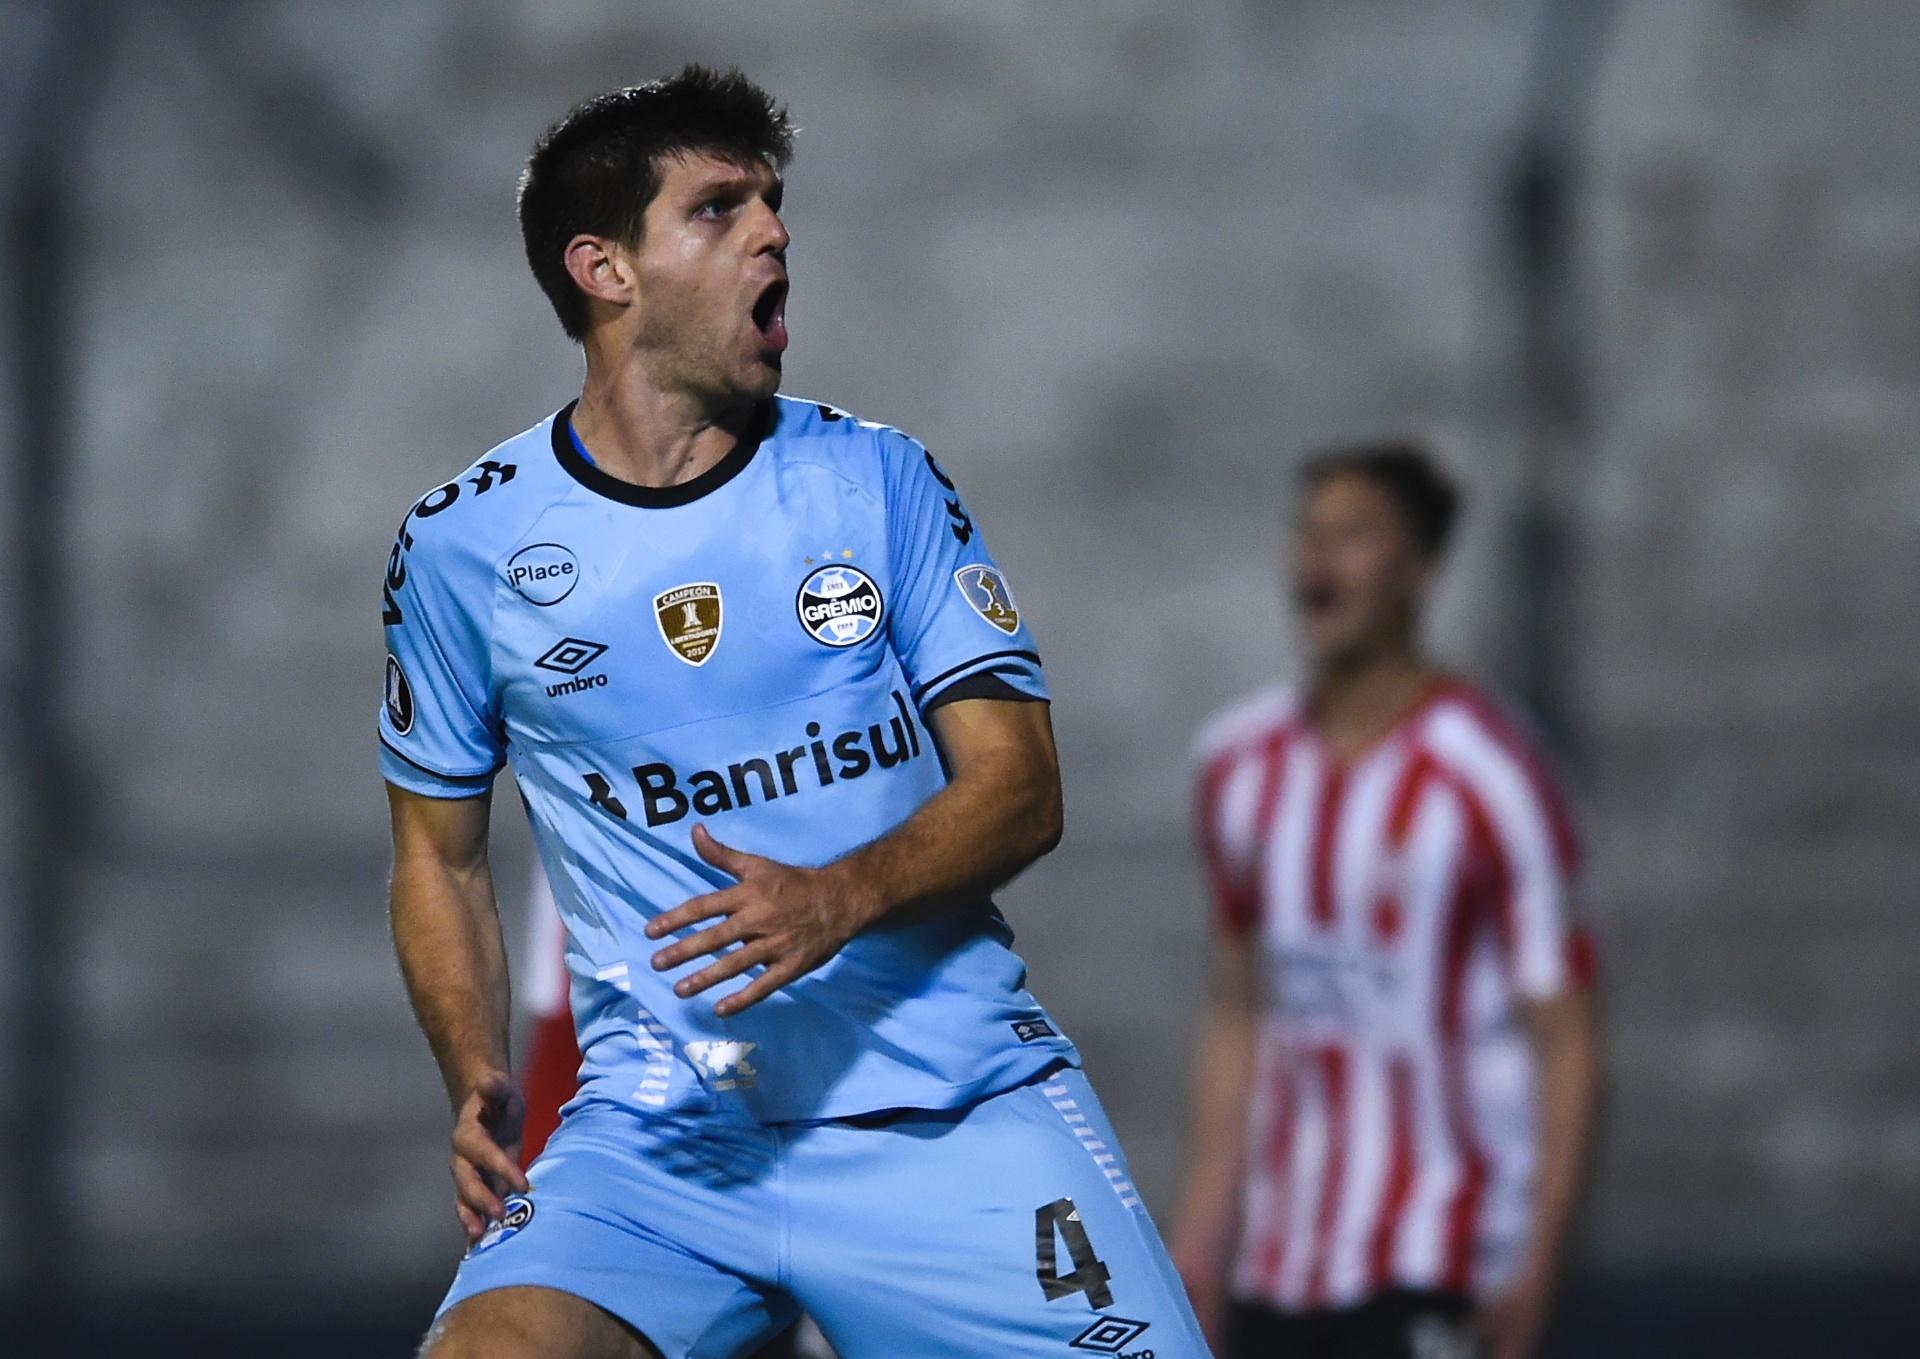 Kannemann valoriza gol fora do Grêmio